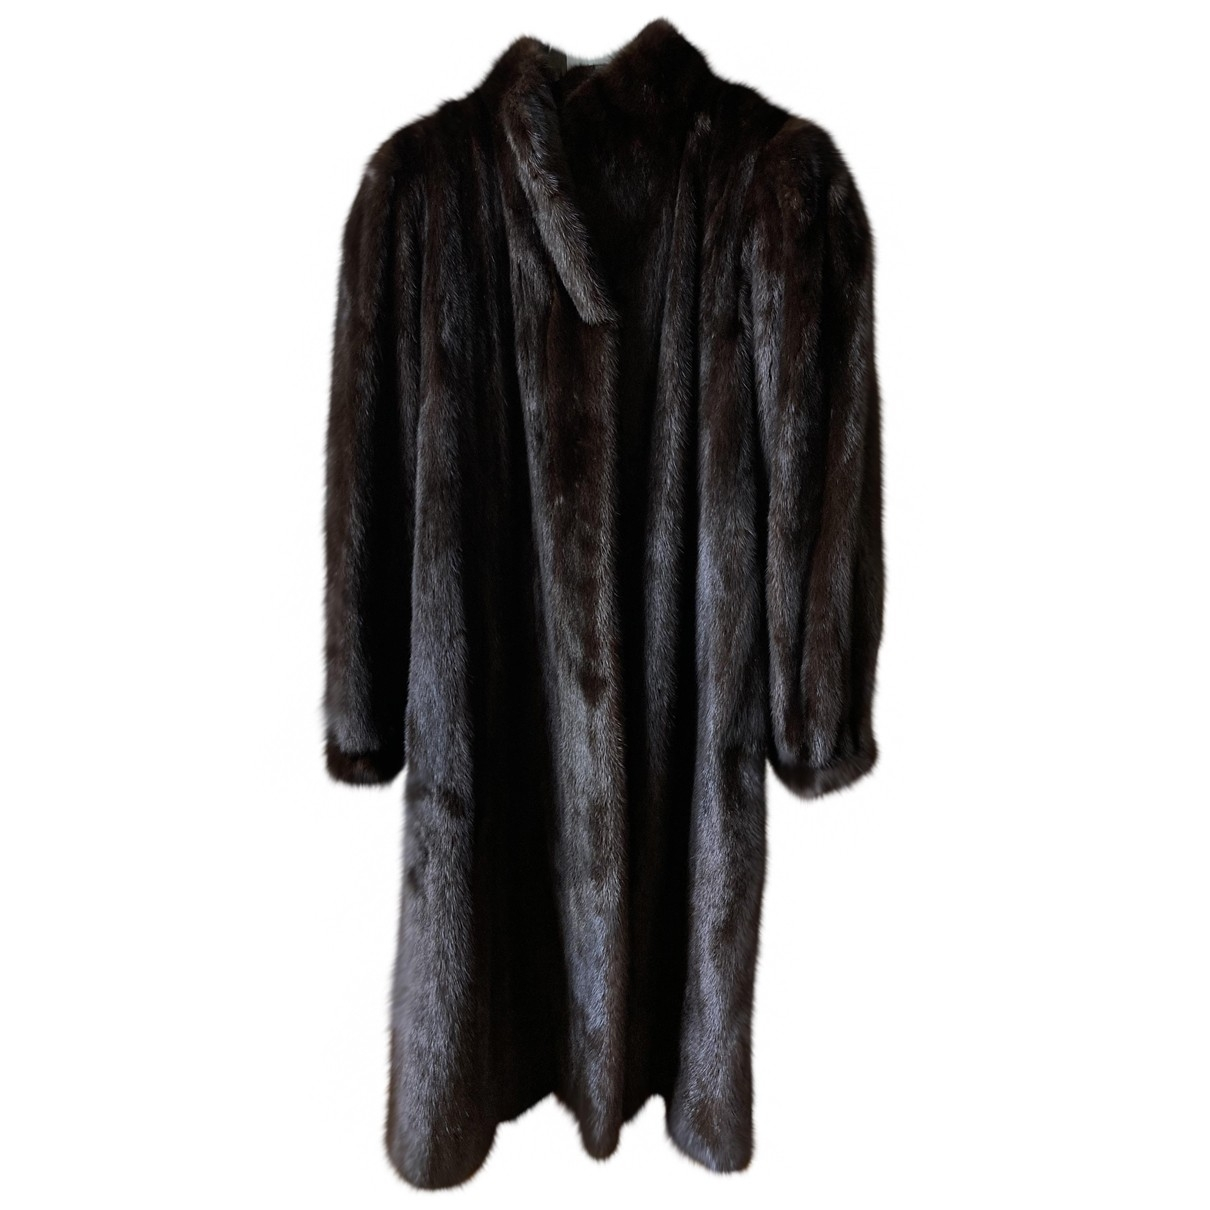 Yves Saint Laurent N Brown Mink Coat for Women